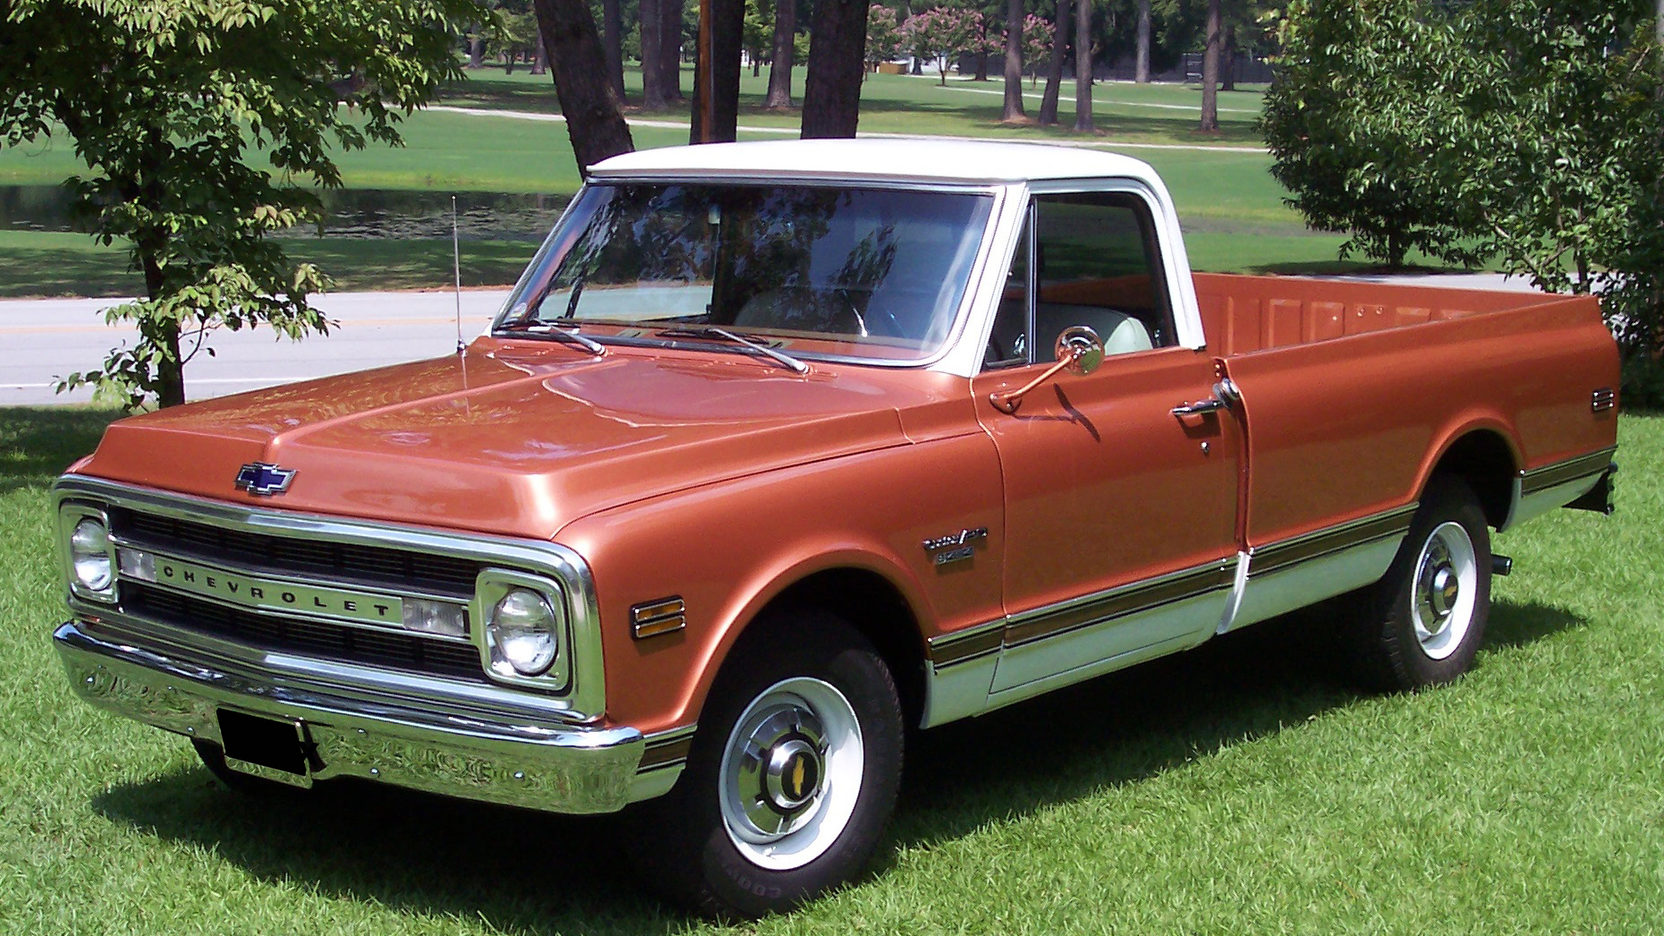 hight resolution of full screen 1970 chevrolet c20 pickup